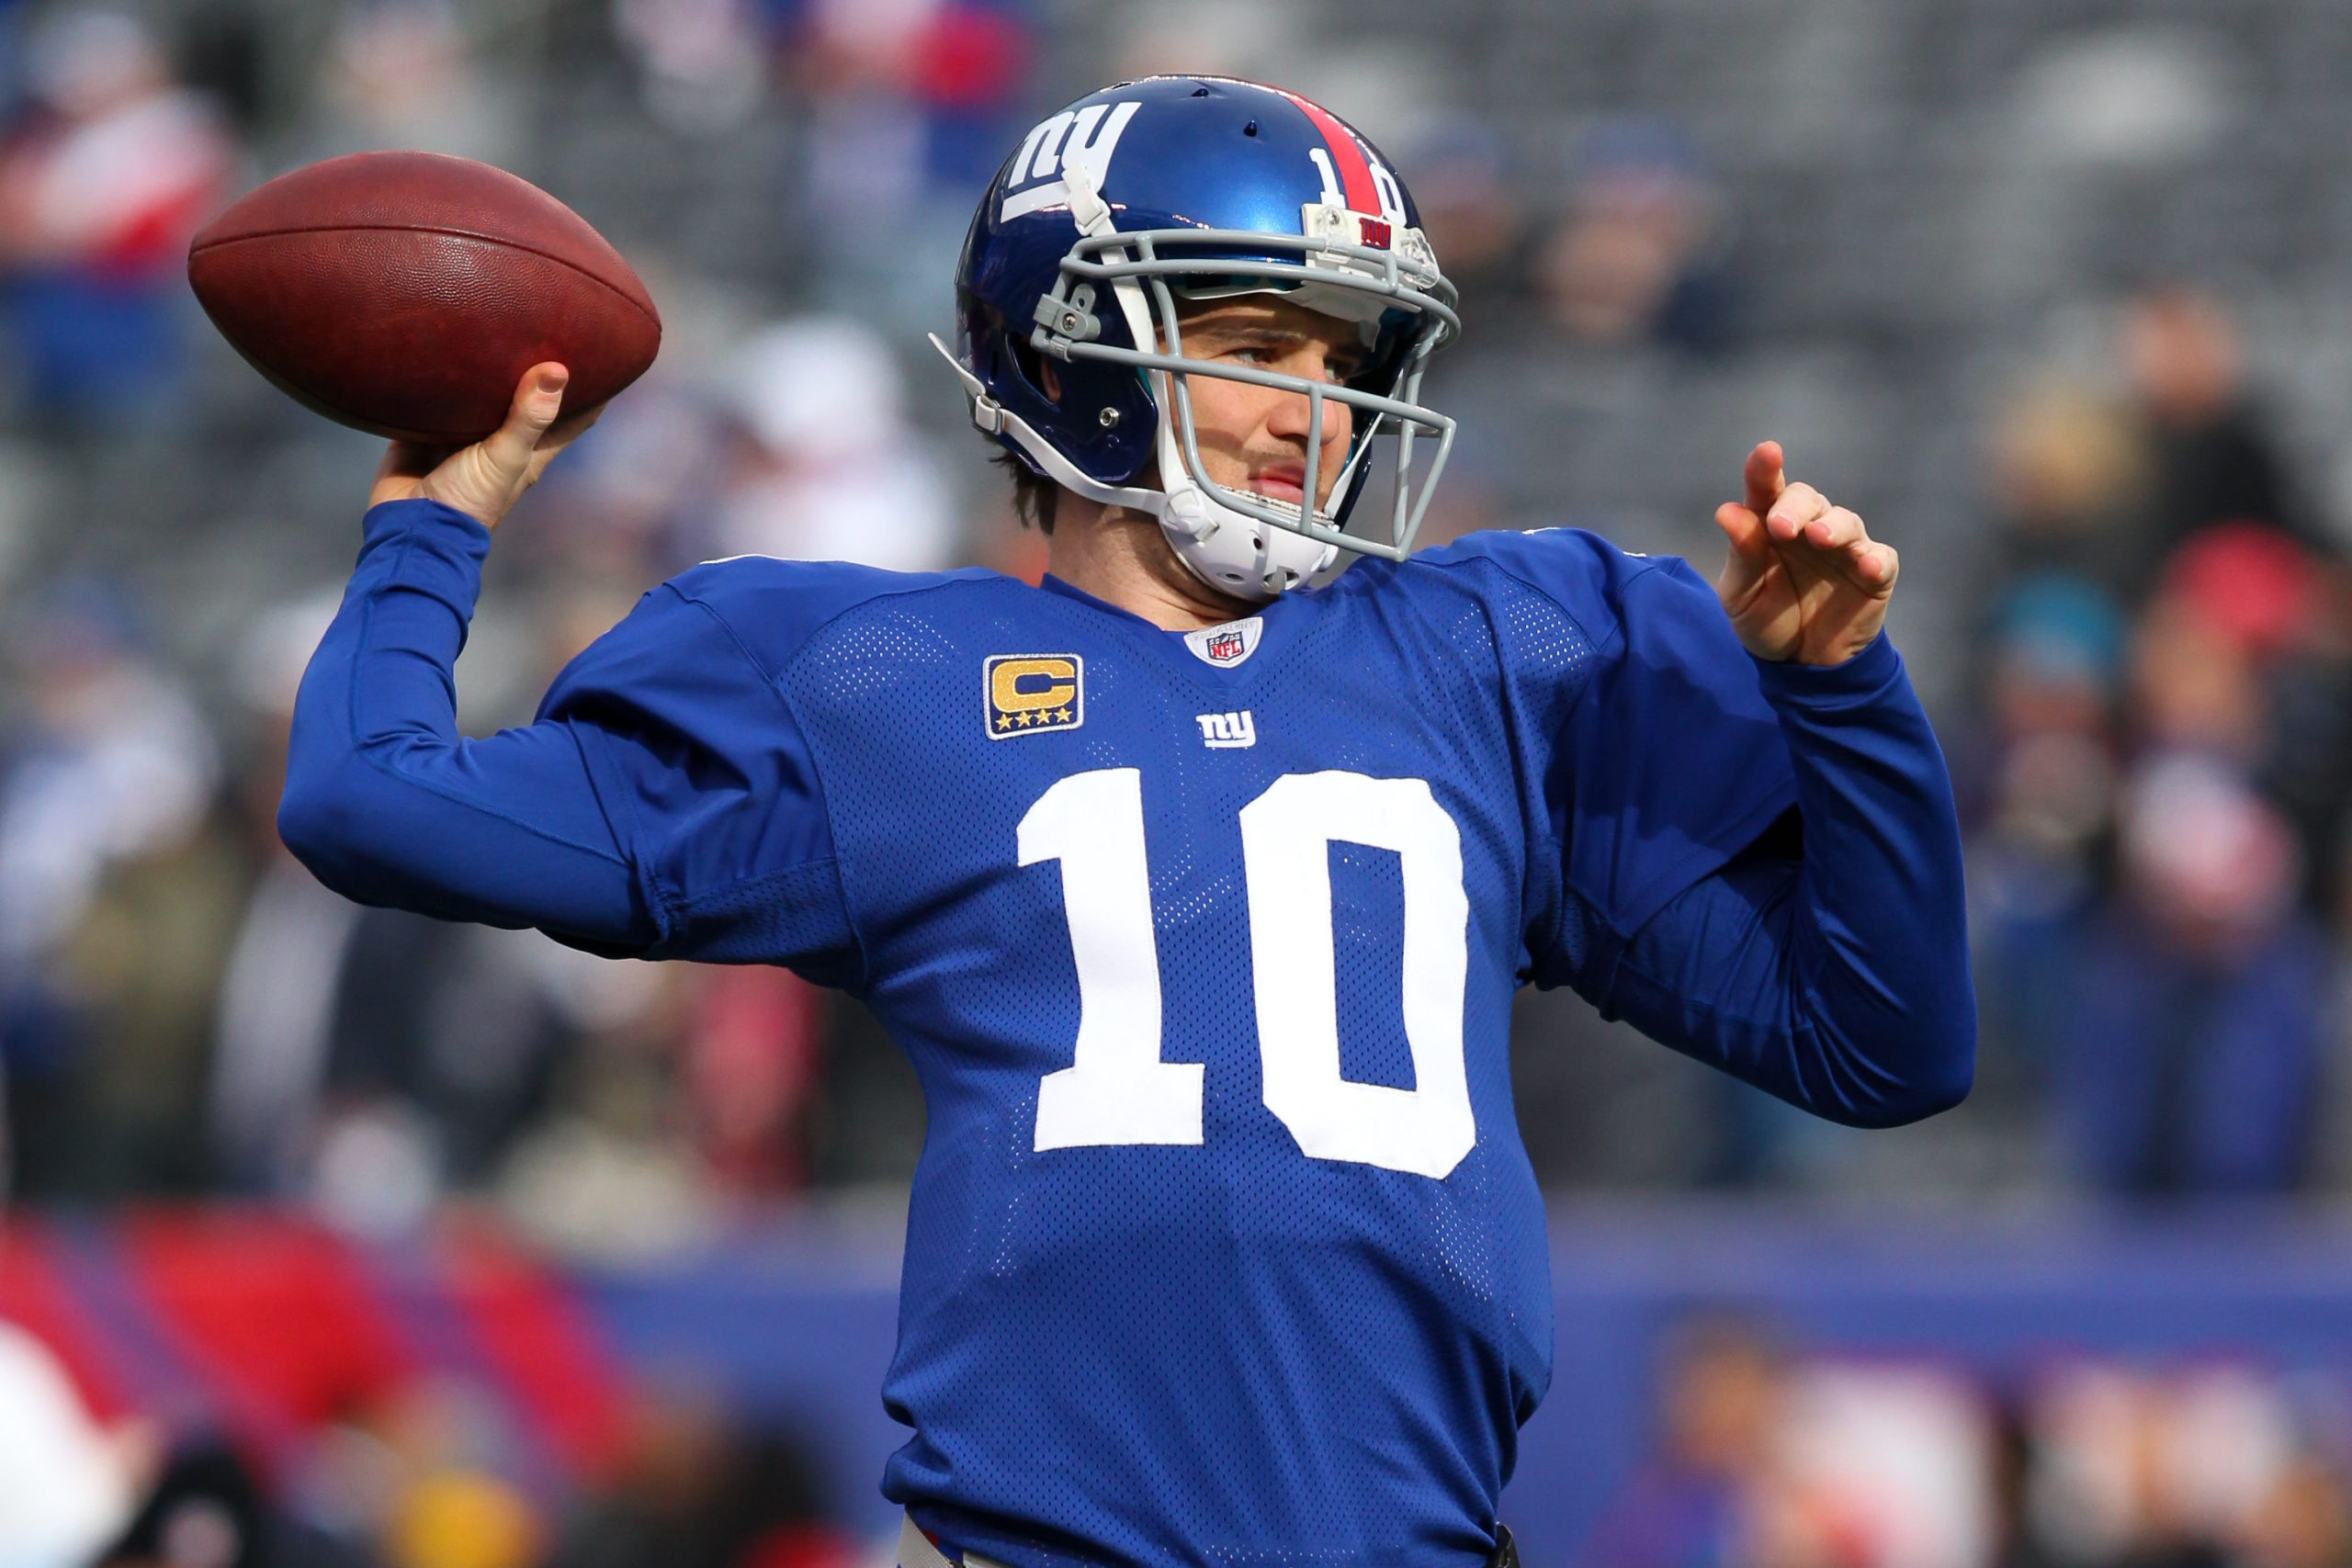 Peyton Manning Accuses New England Patriots of Bugging Locker Room